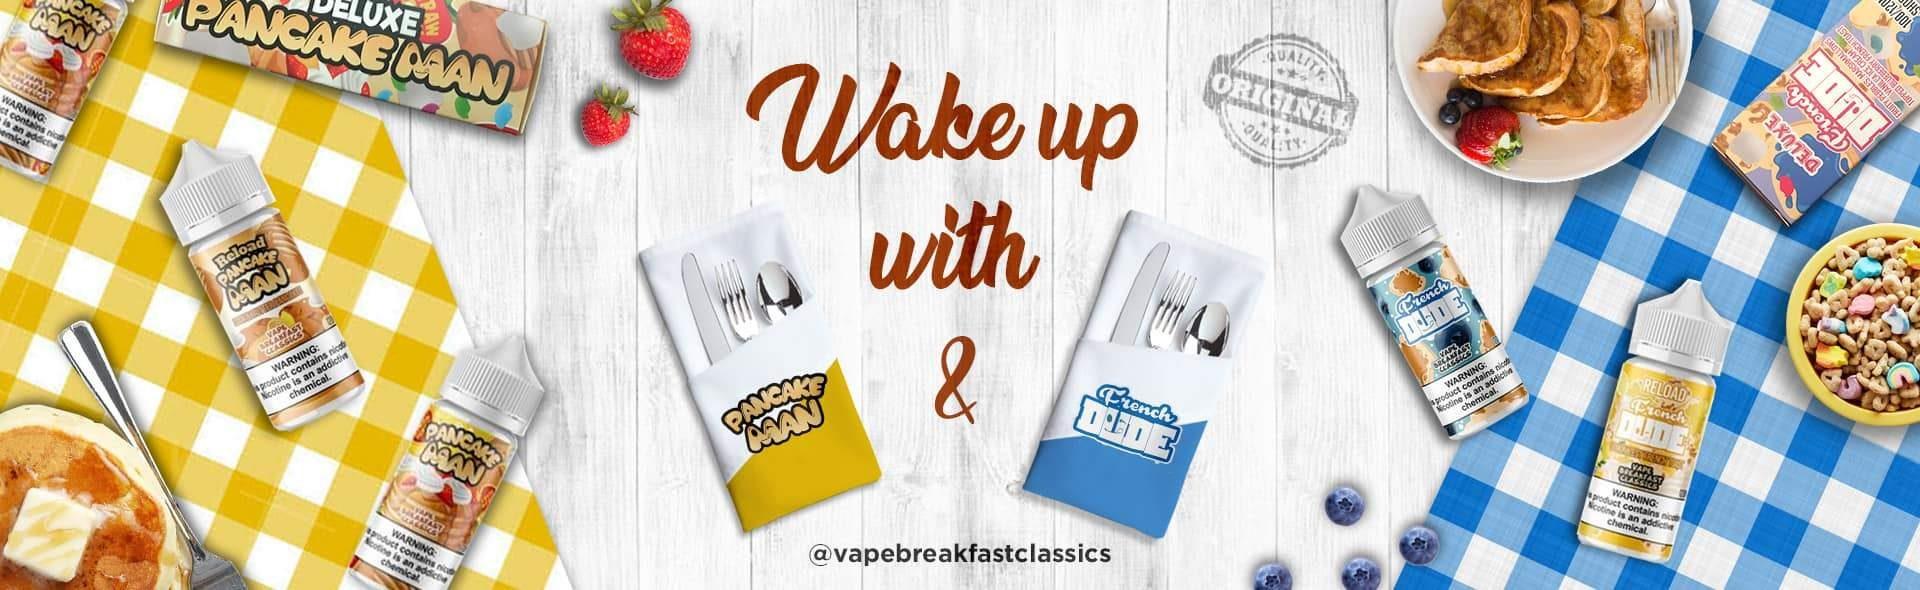 vape breakfast classics UK